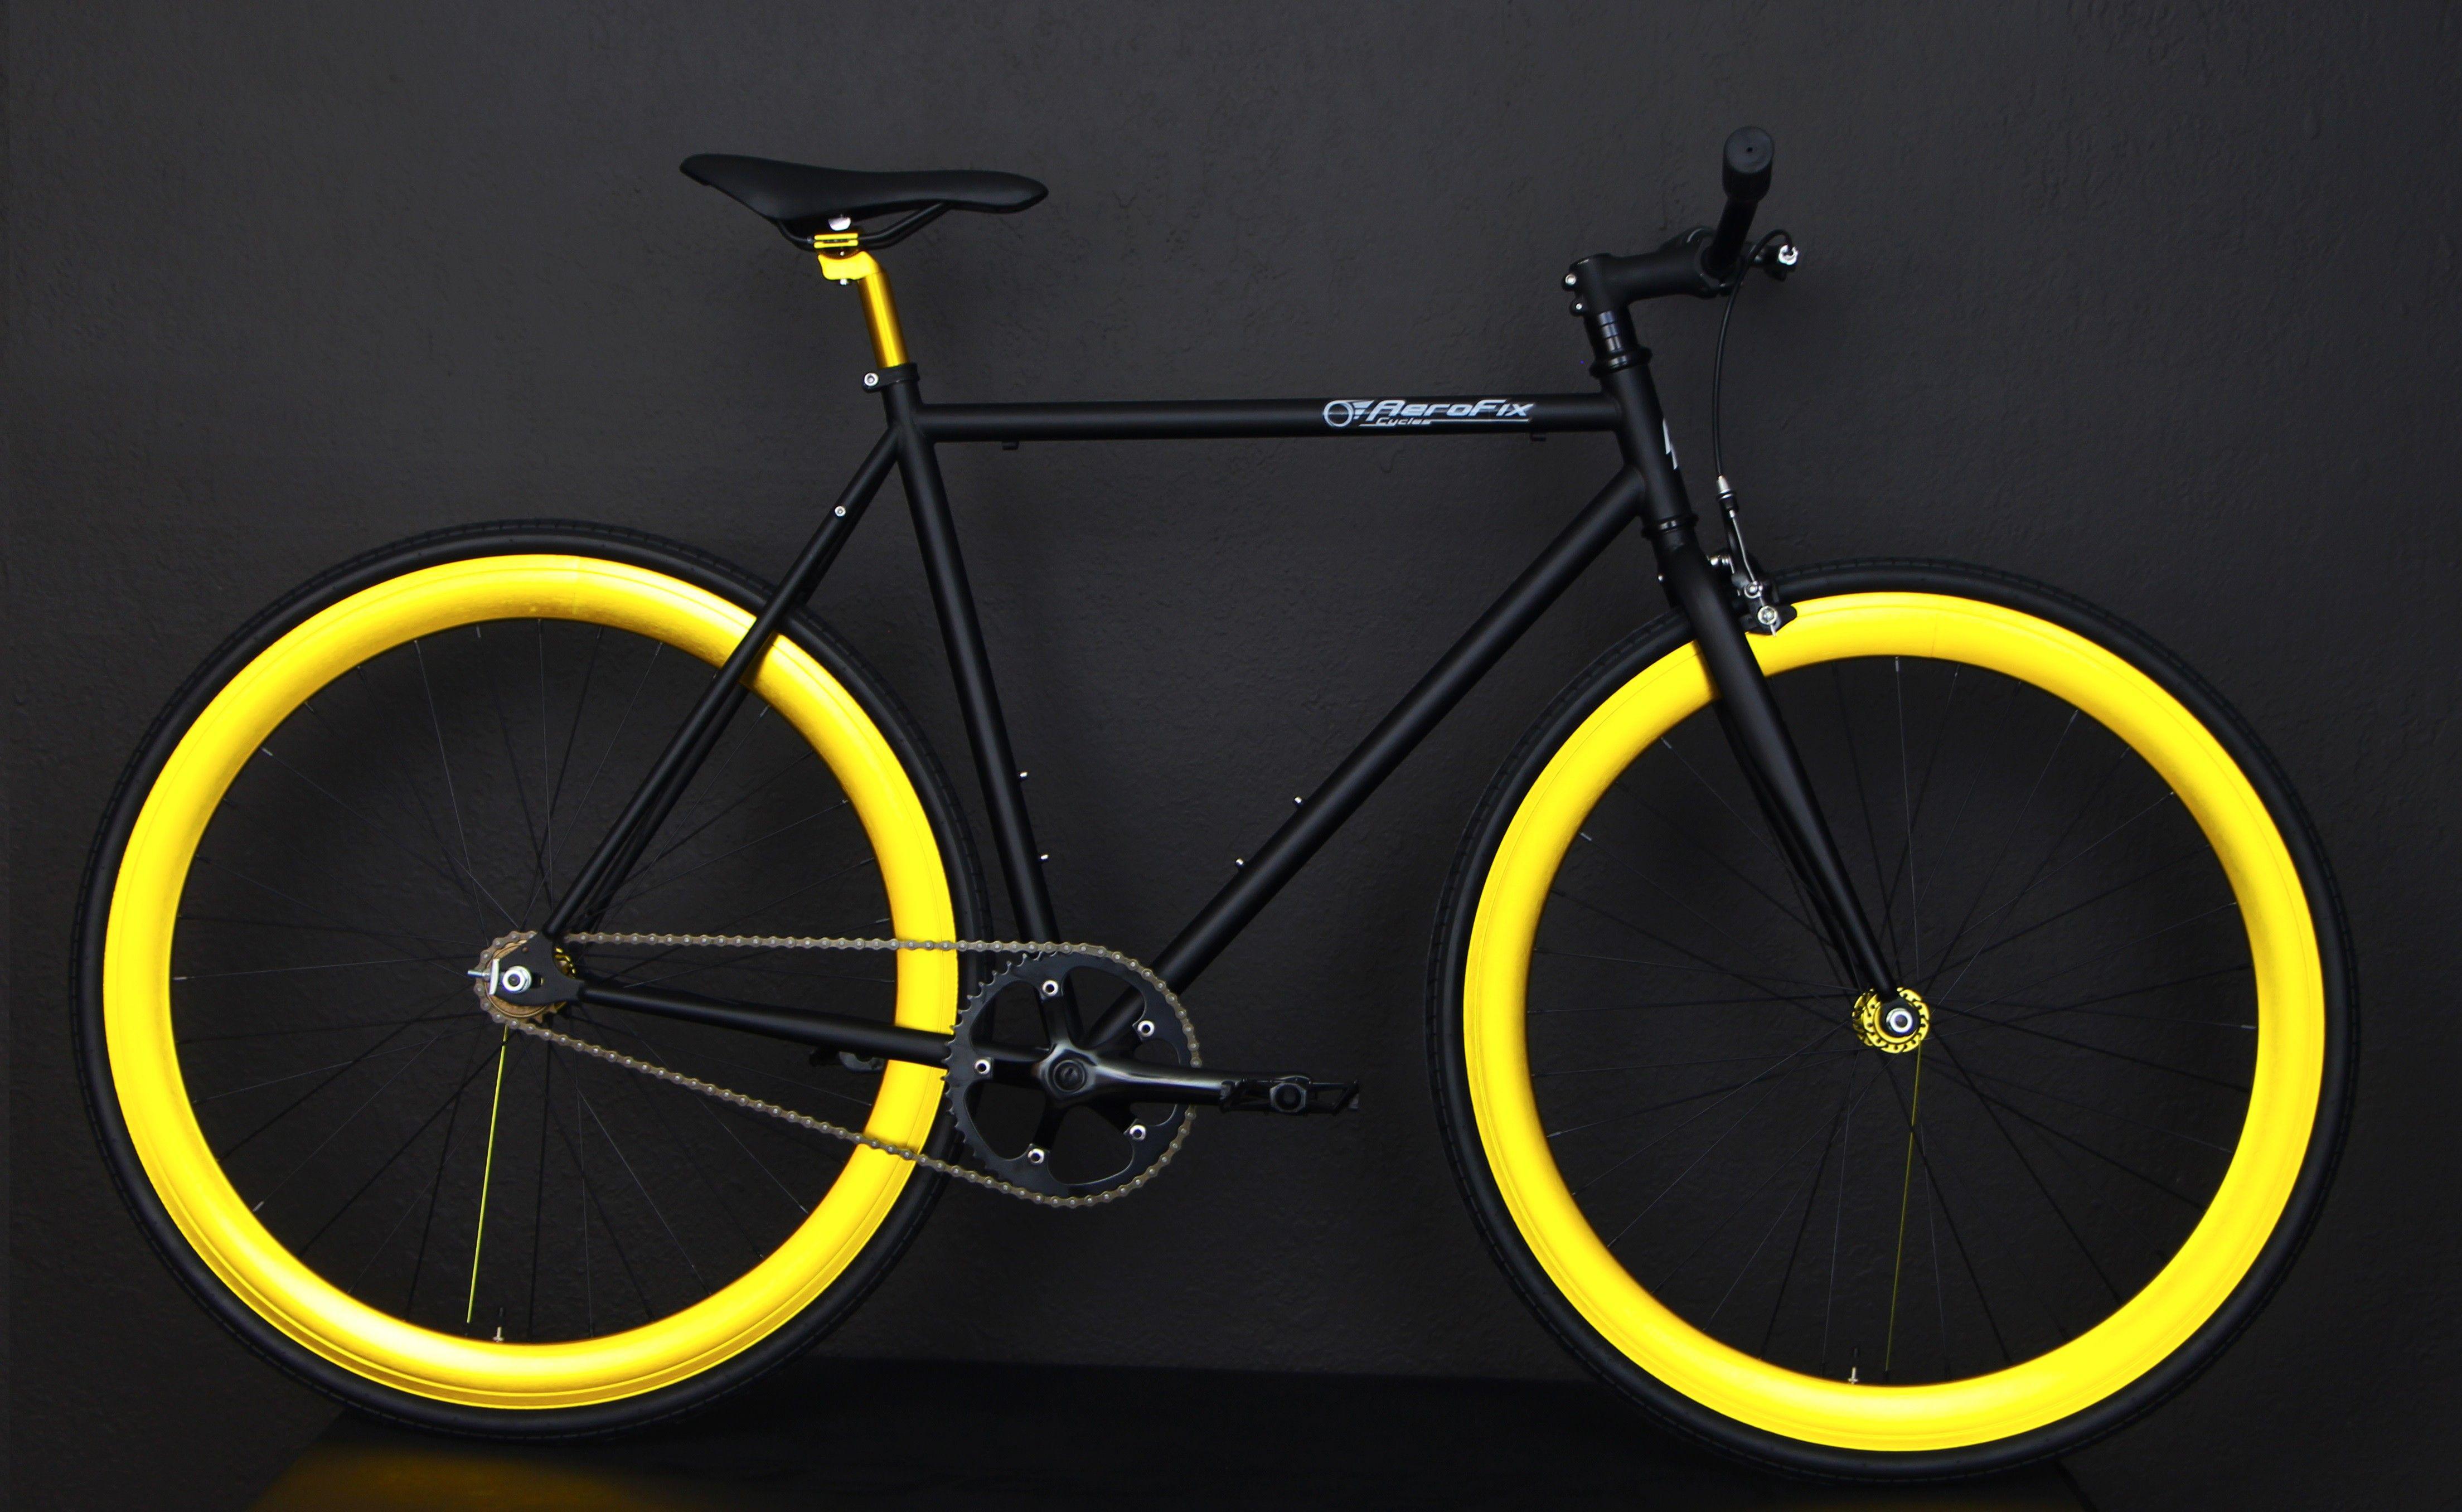 Black and Anodized Gold Fixie, Fixies, Fixie Bikes ...